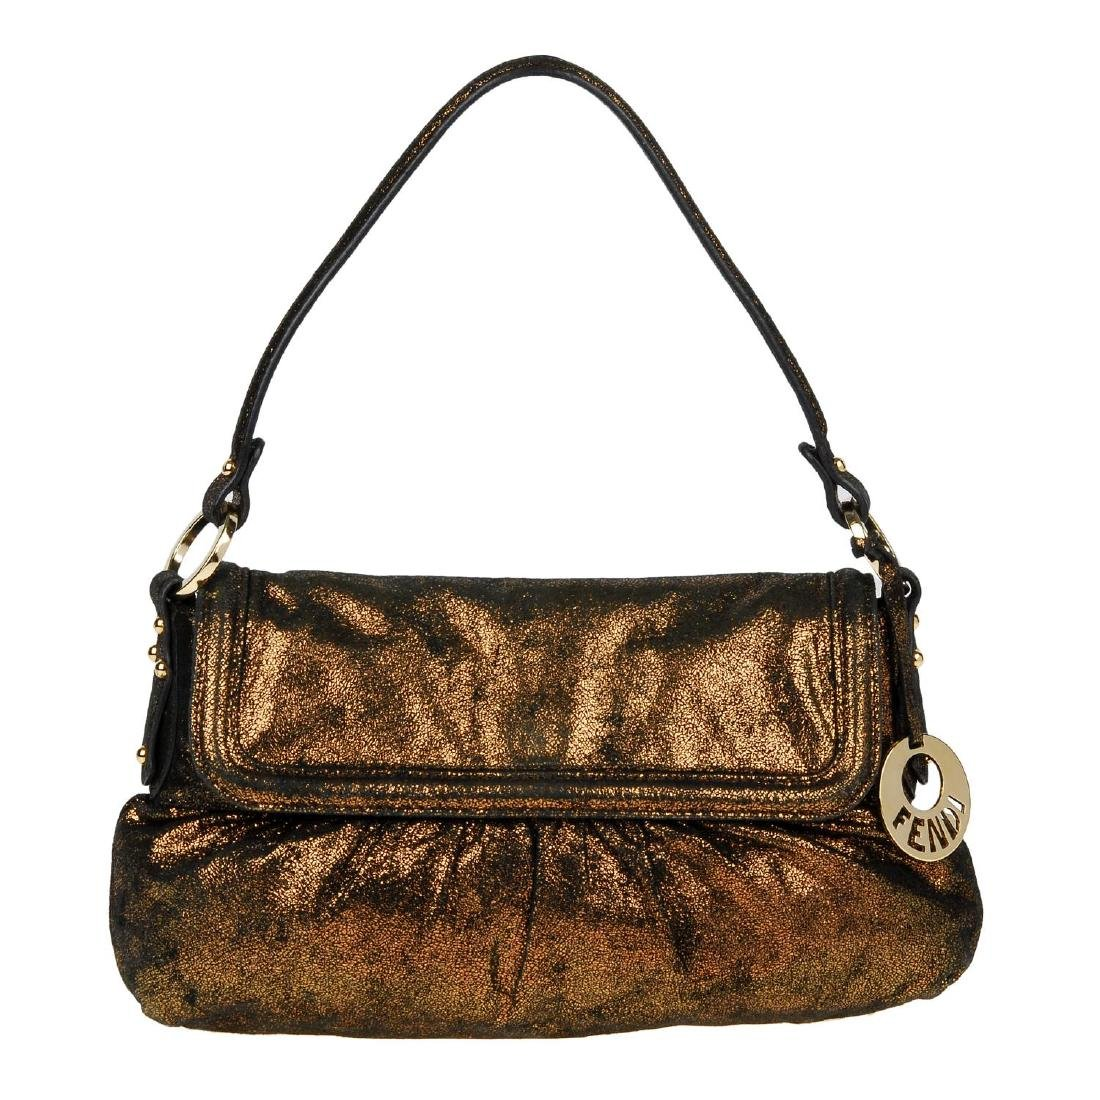 FENDI - a bronze metallic Chef Flap handbag. Designed